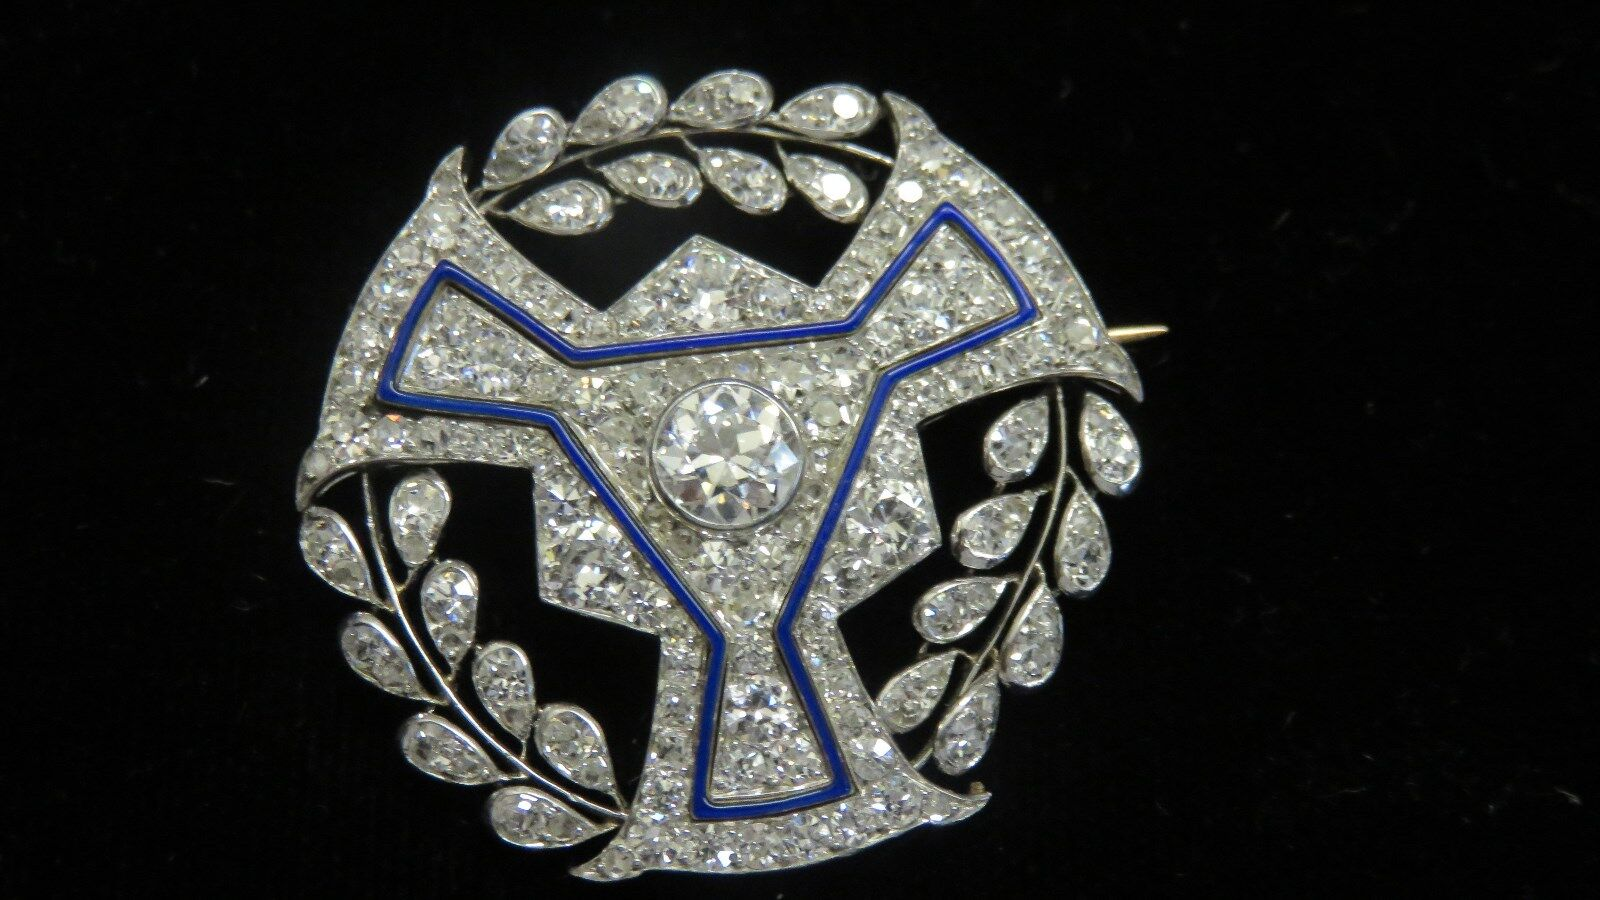 BOUCHERONPARISART DECOPLATINUM+DIAMONDS+blueE ENAMELBROOCH PINI4.00 CARATS